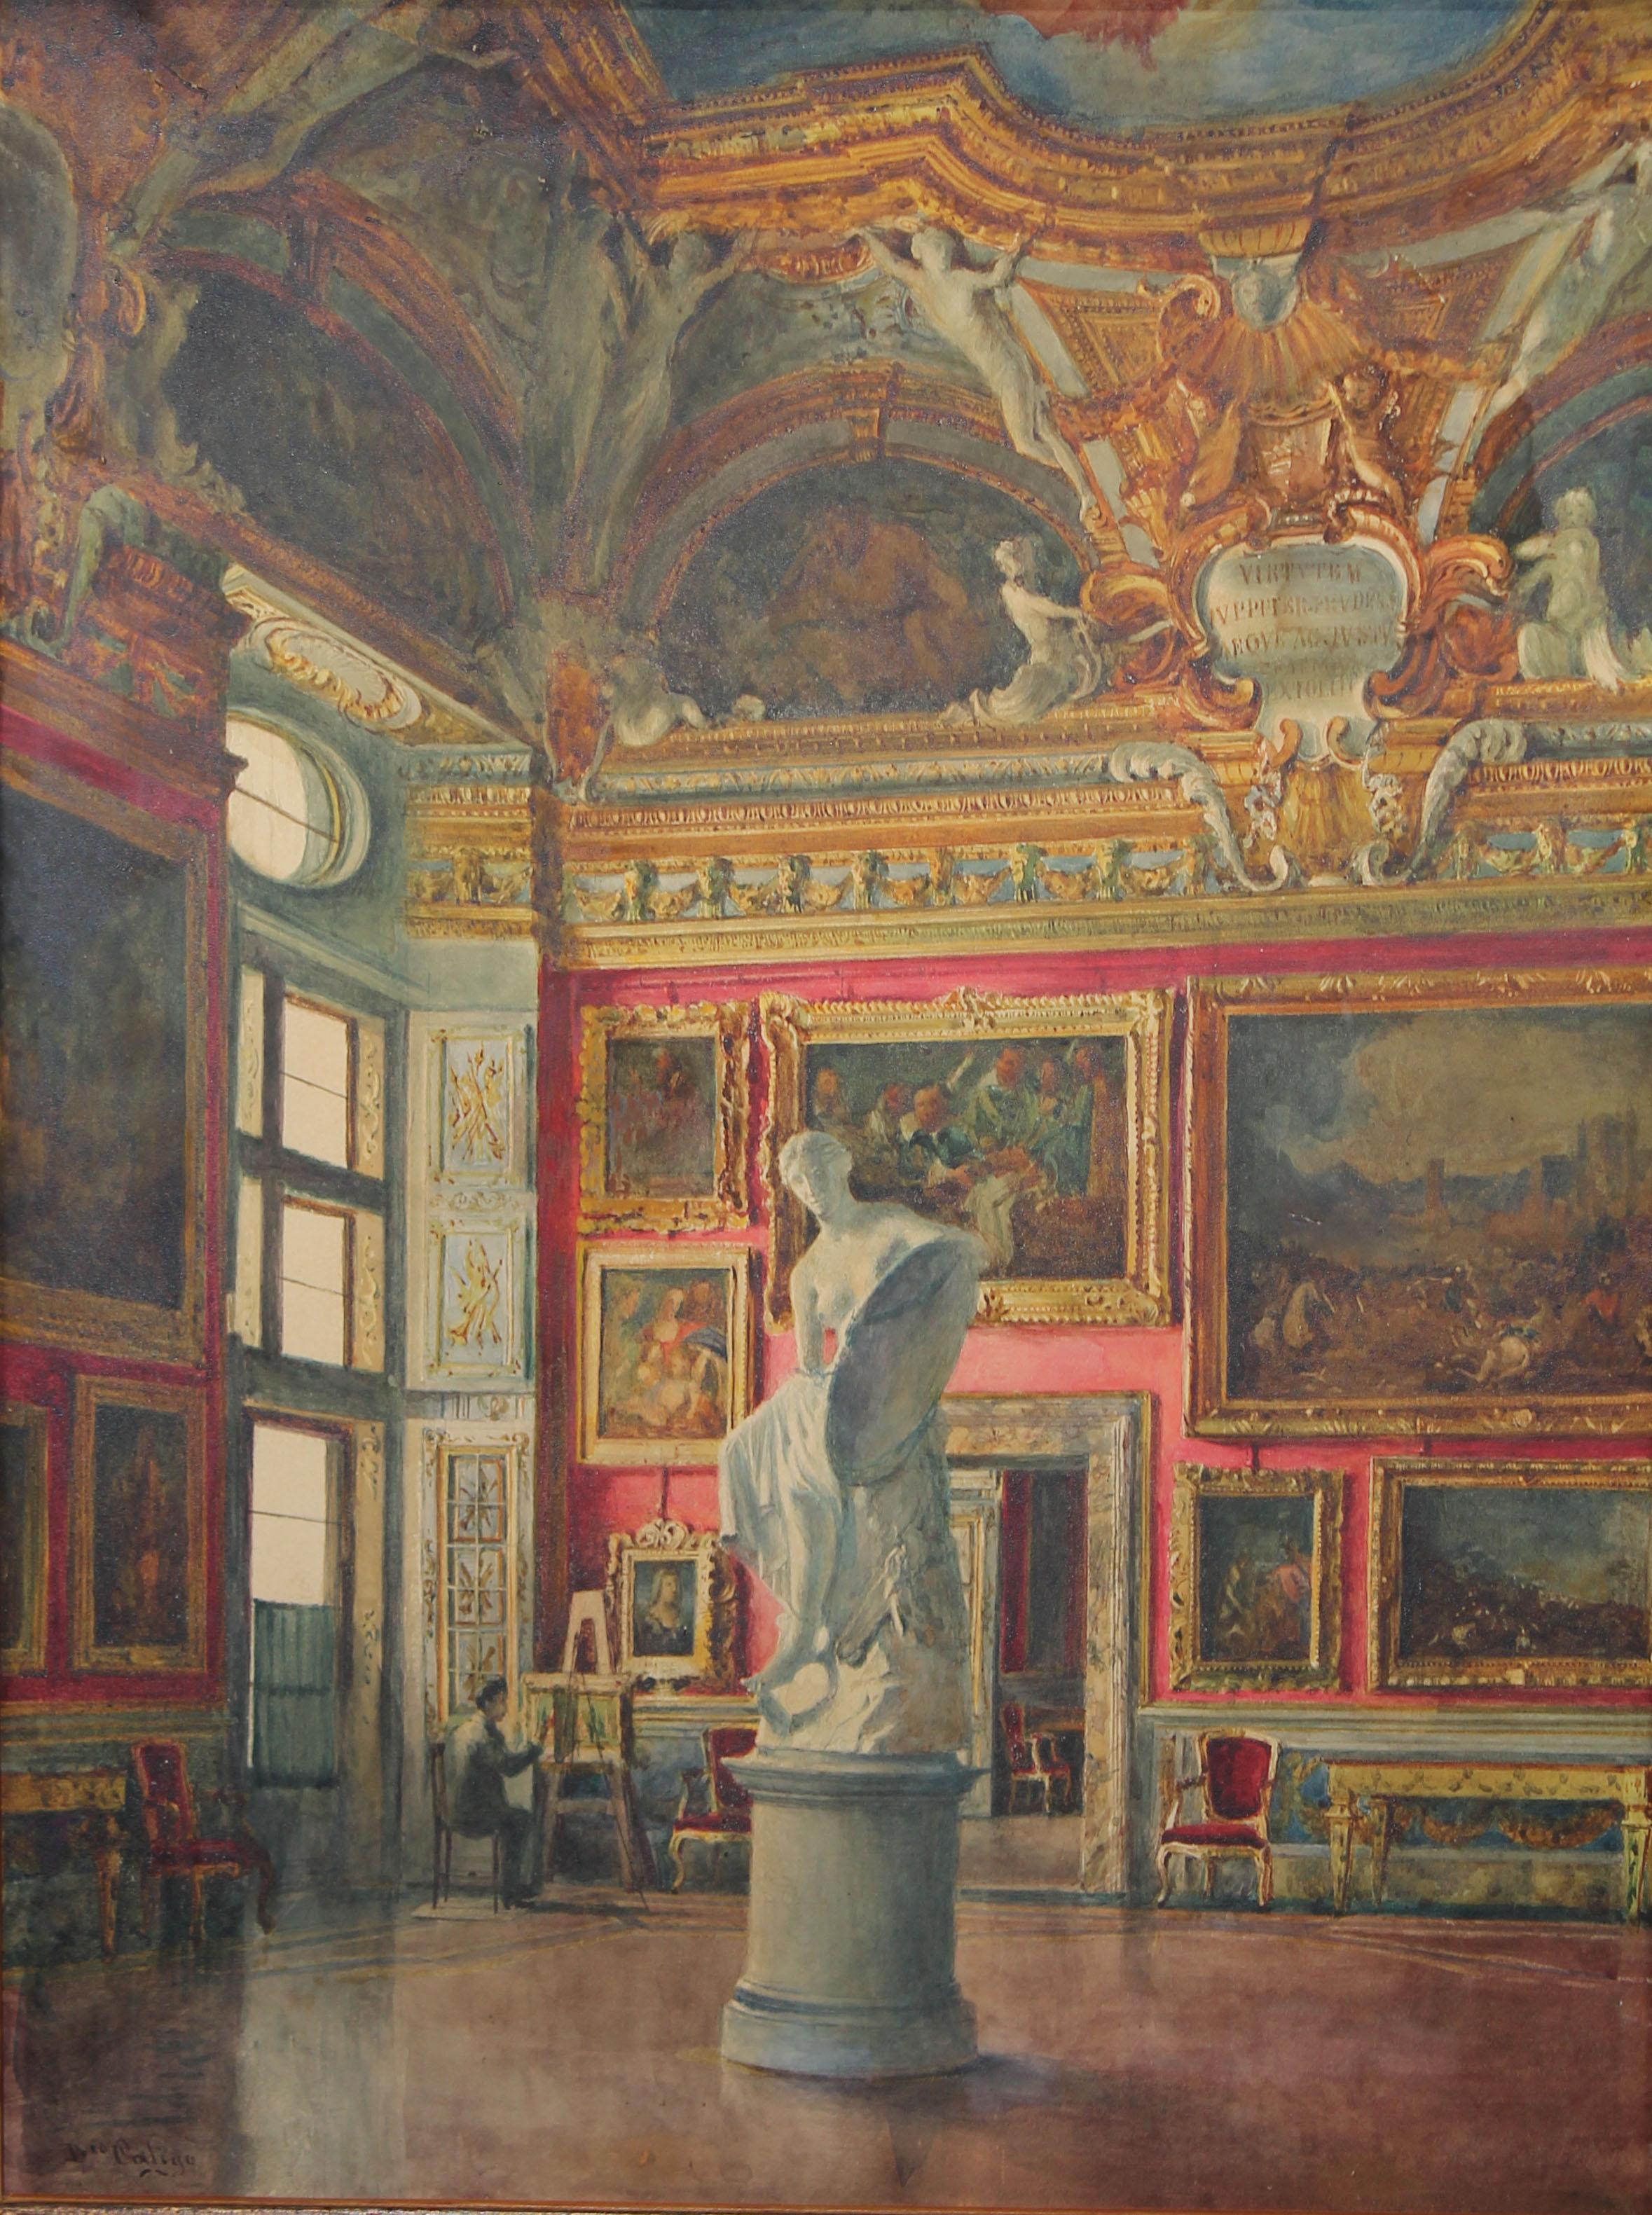 Lot 68 - Domenico Caligo (fl. 1862-1880) Pitti Palace